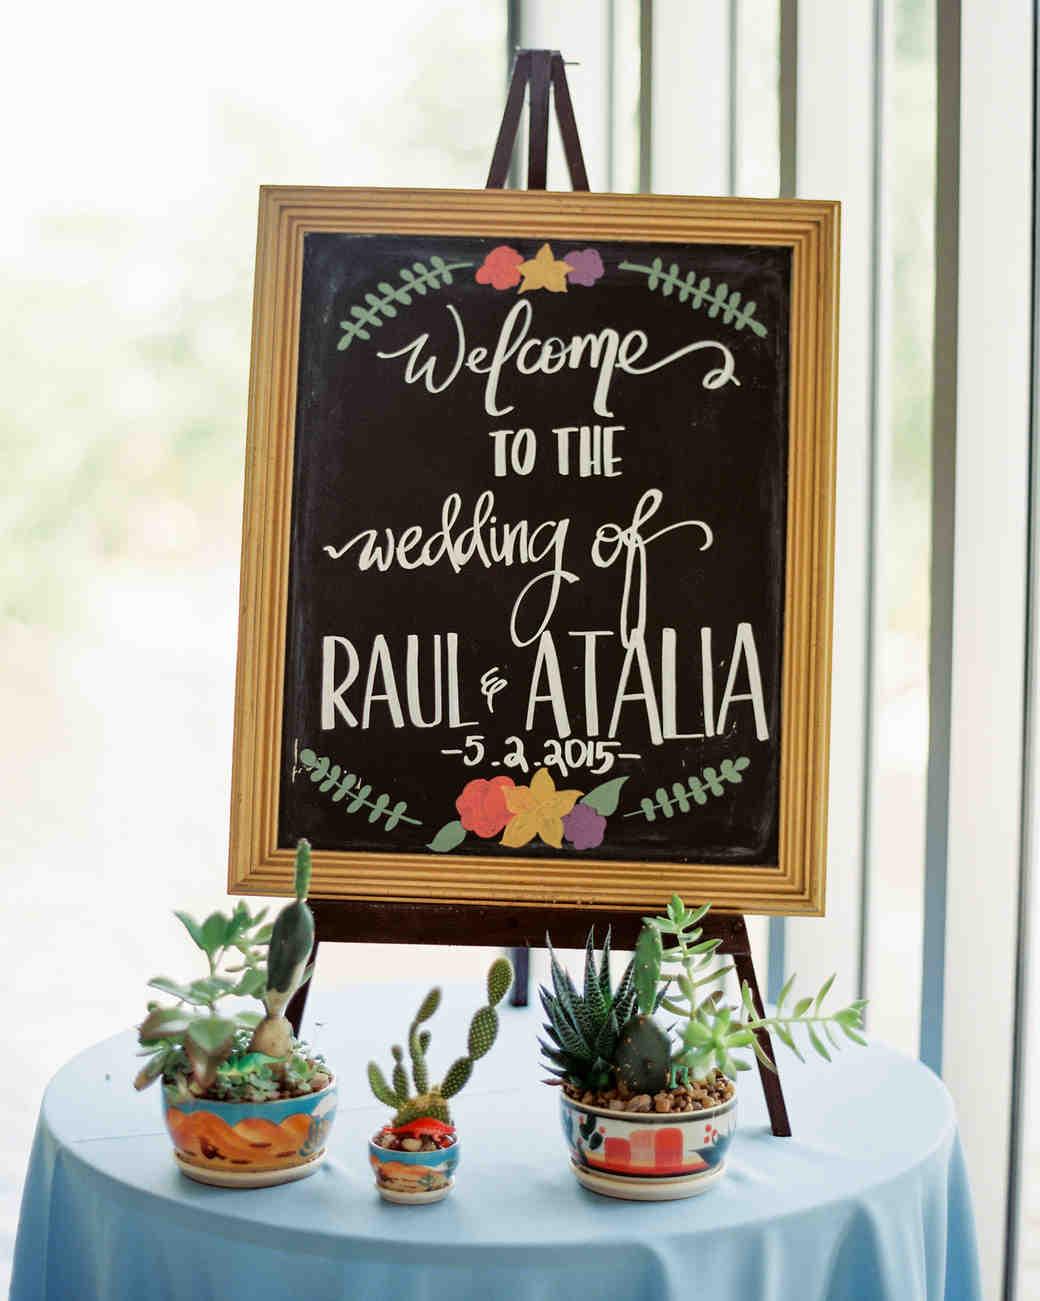 atalia-raul-wedding-sign-64-s112395-1215.jpg